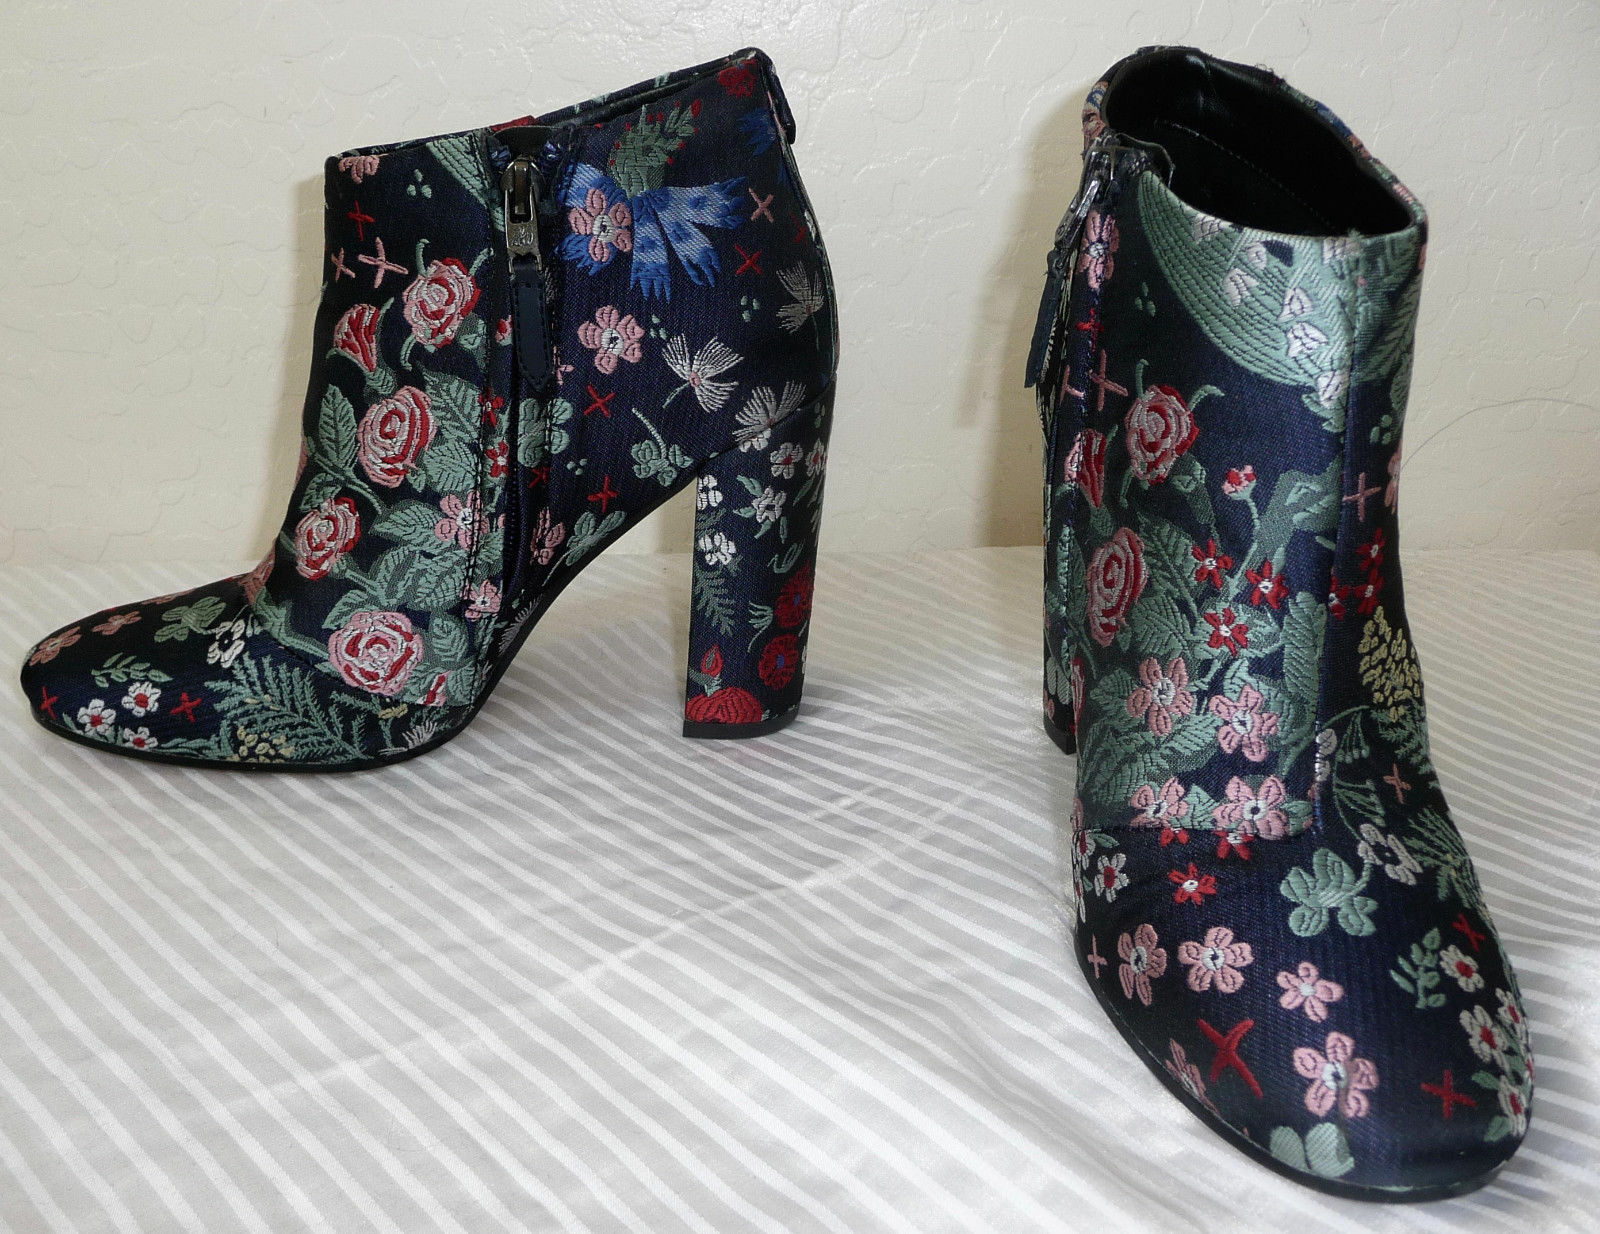 Sam Edleman Cambell Multi Floral Brocade Bootie Größe 6.5 Originally 160.00